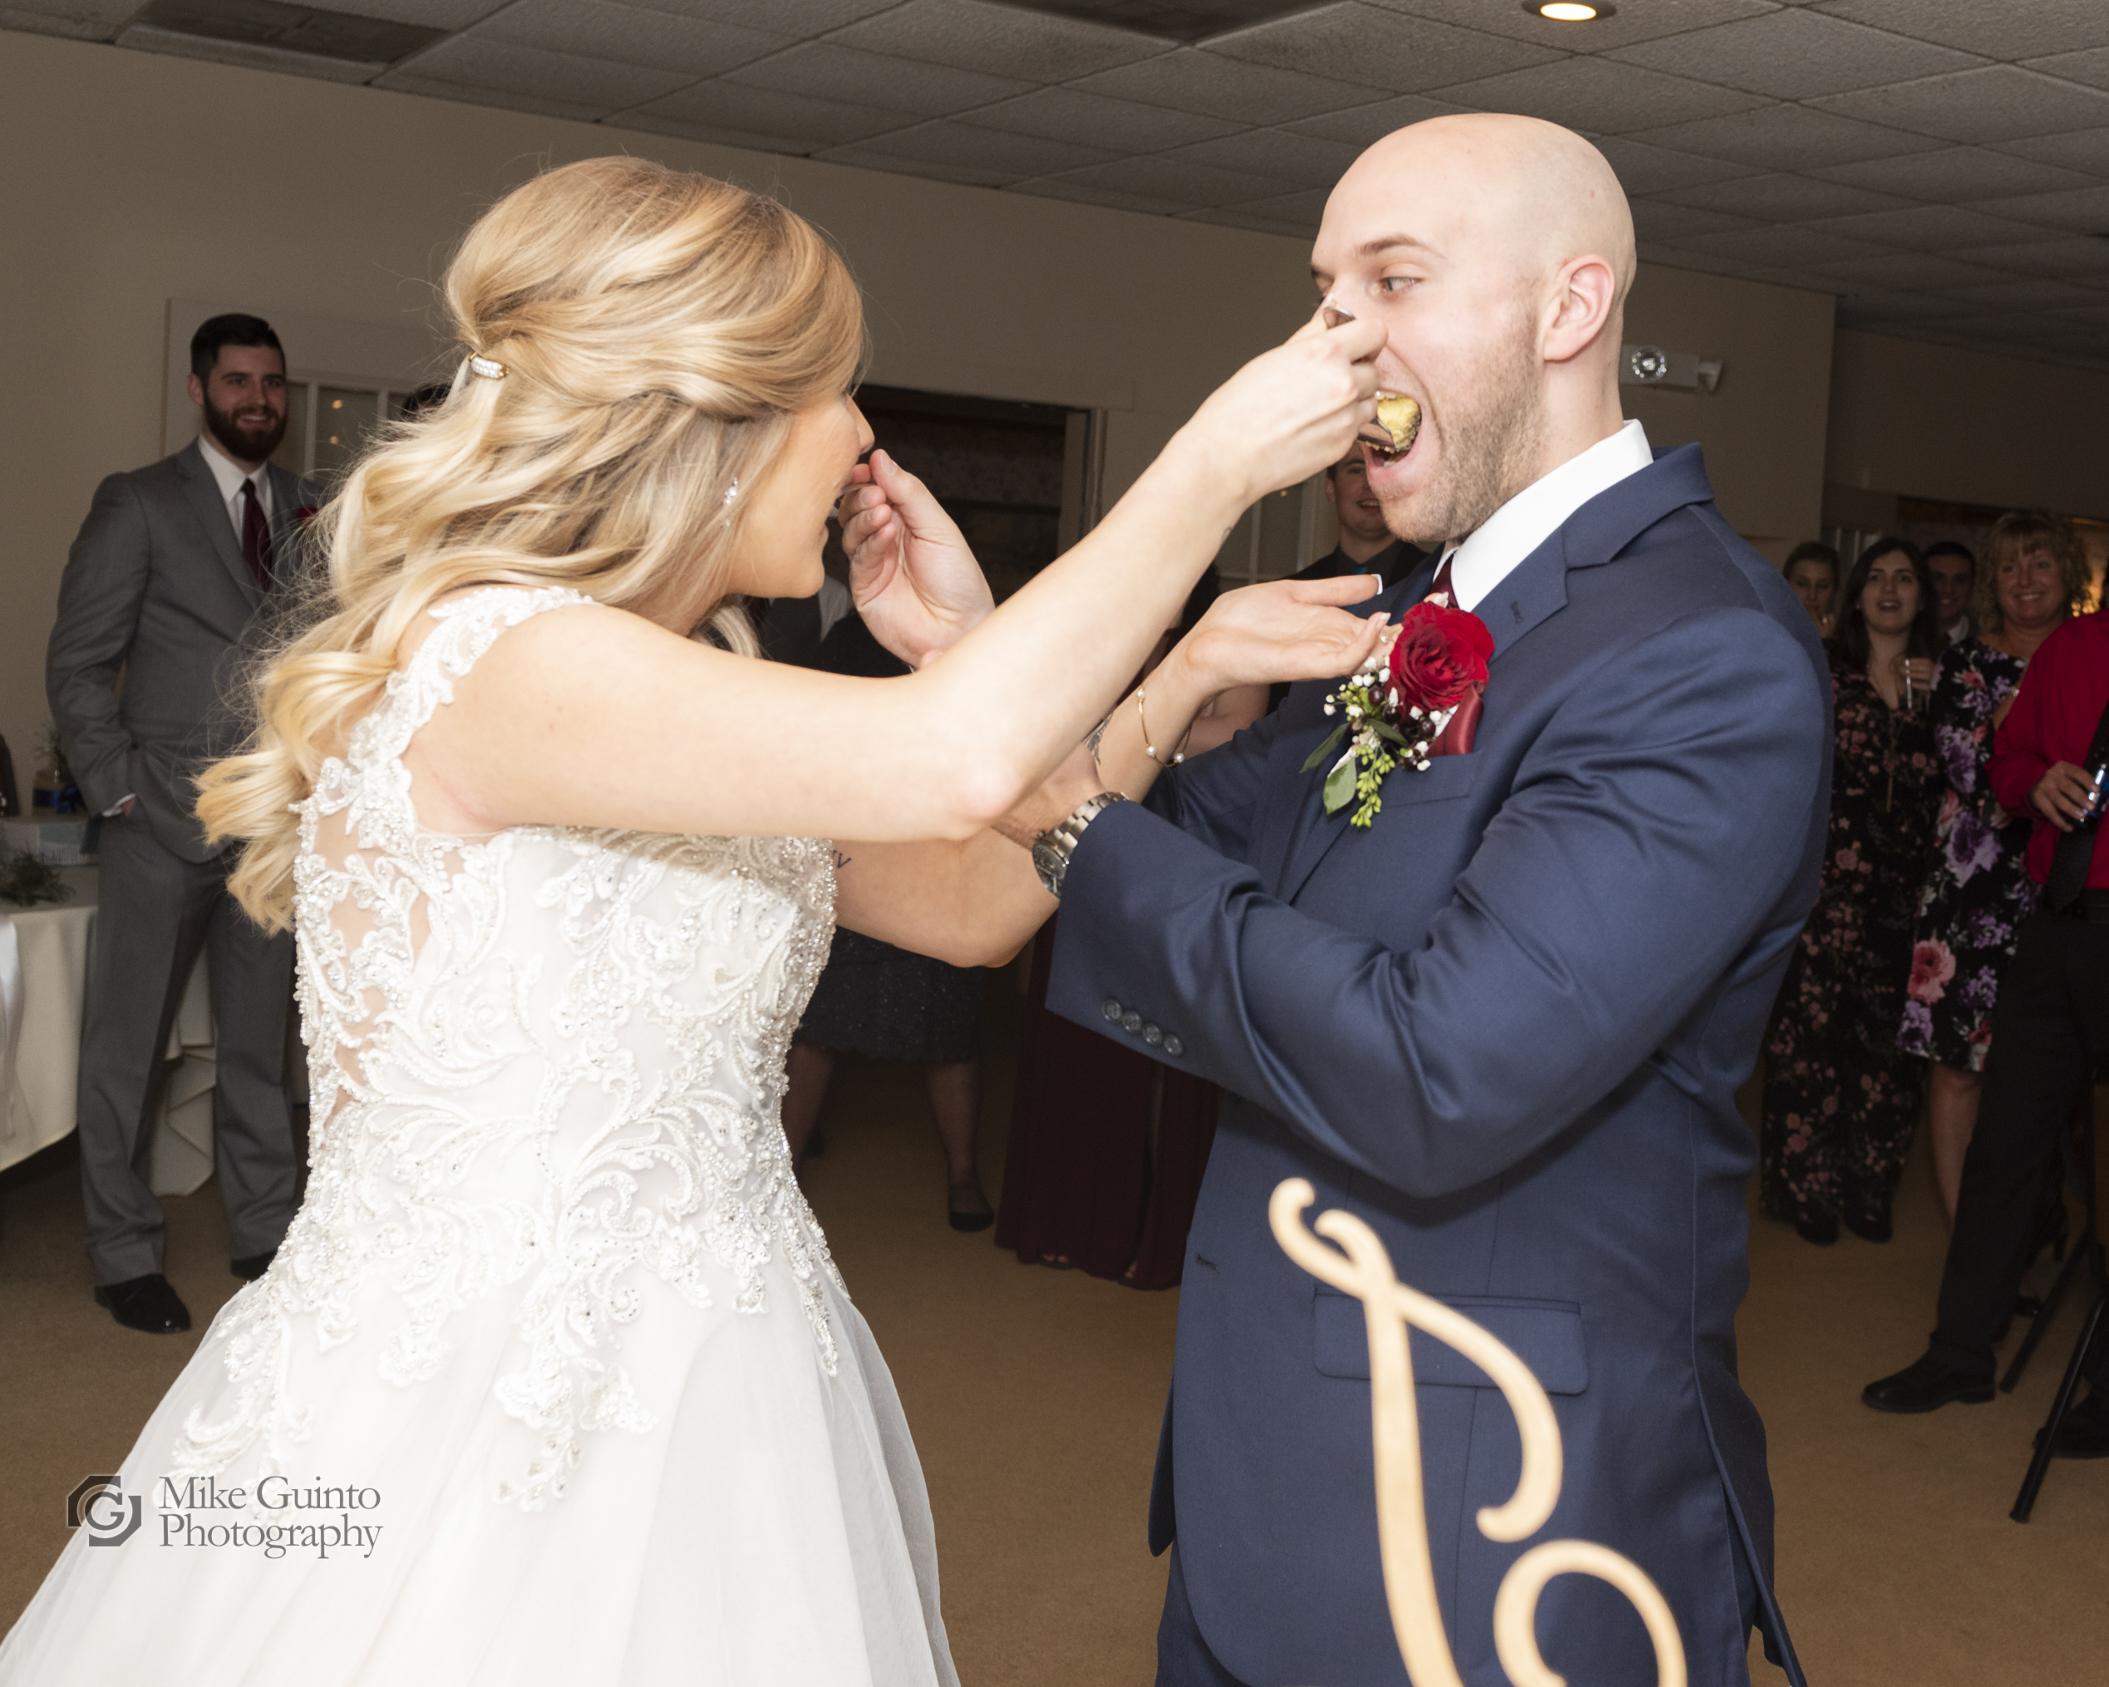 20190223_Wedding_Jaworski_584.jpg